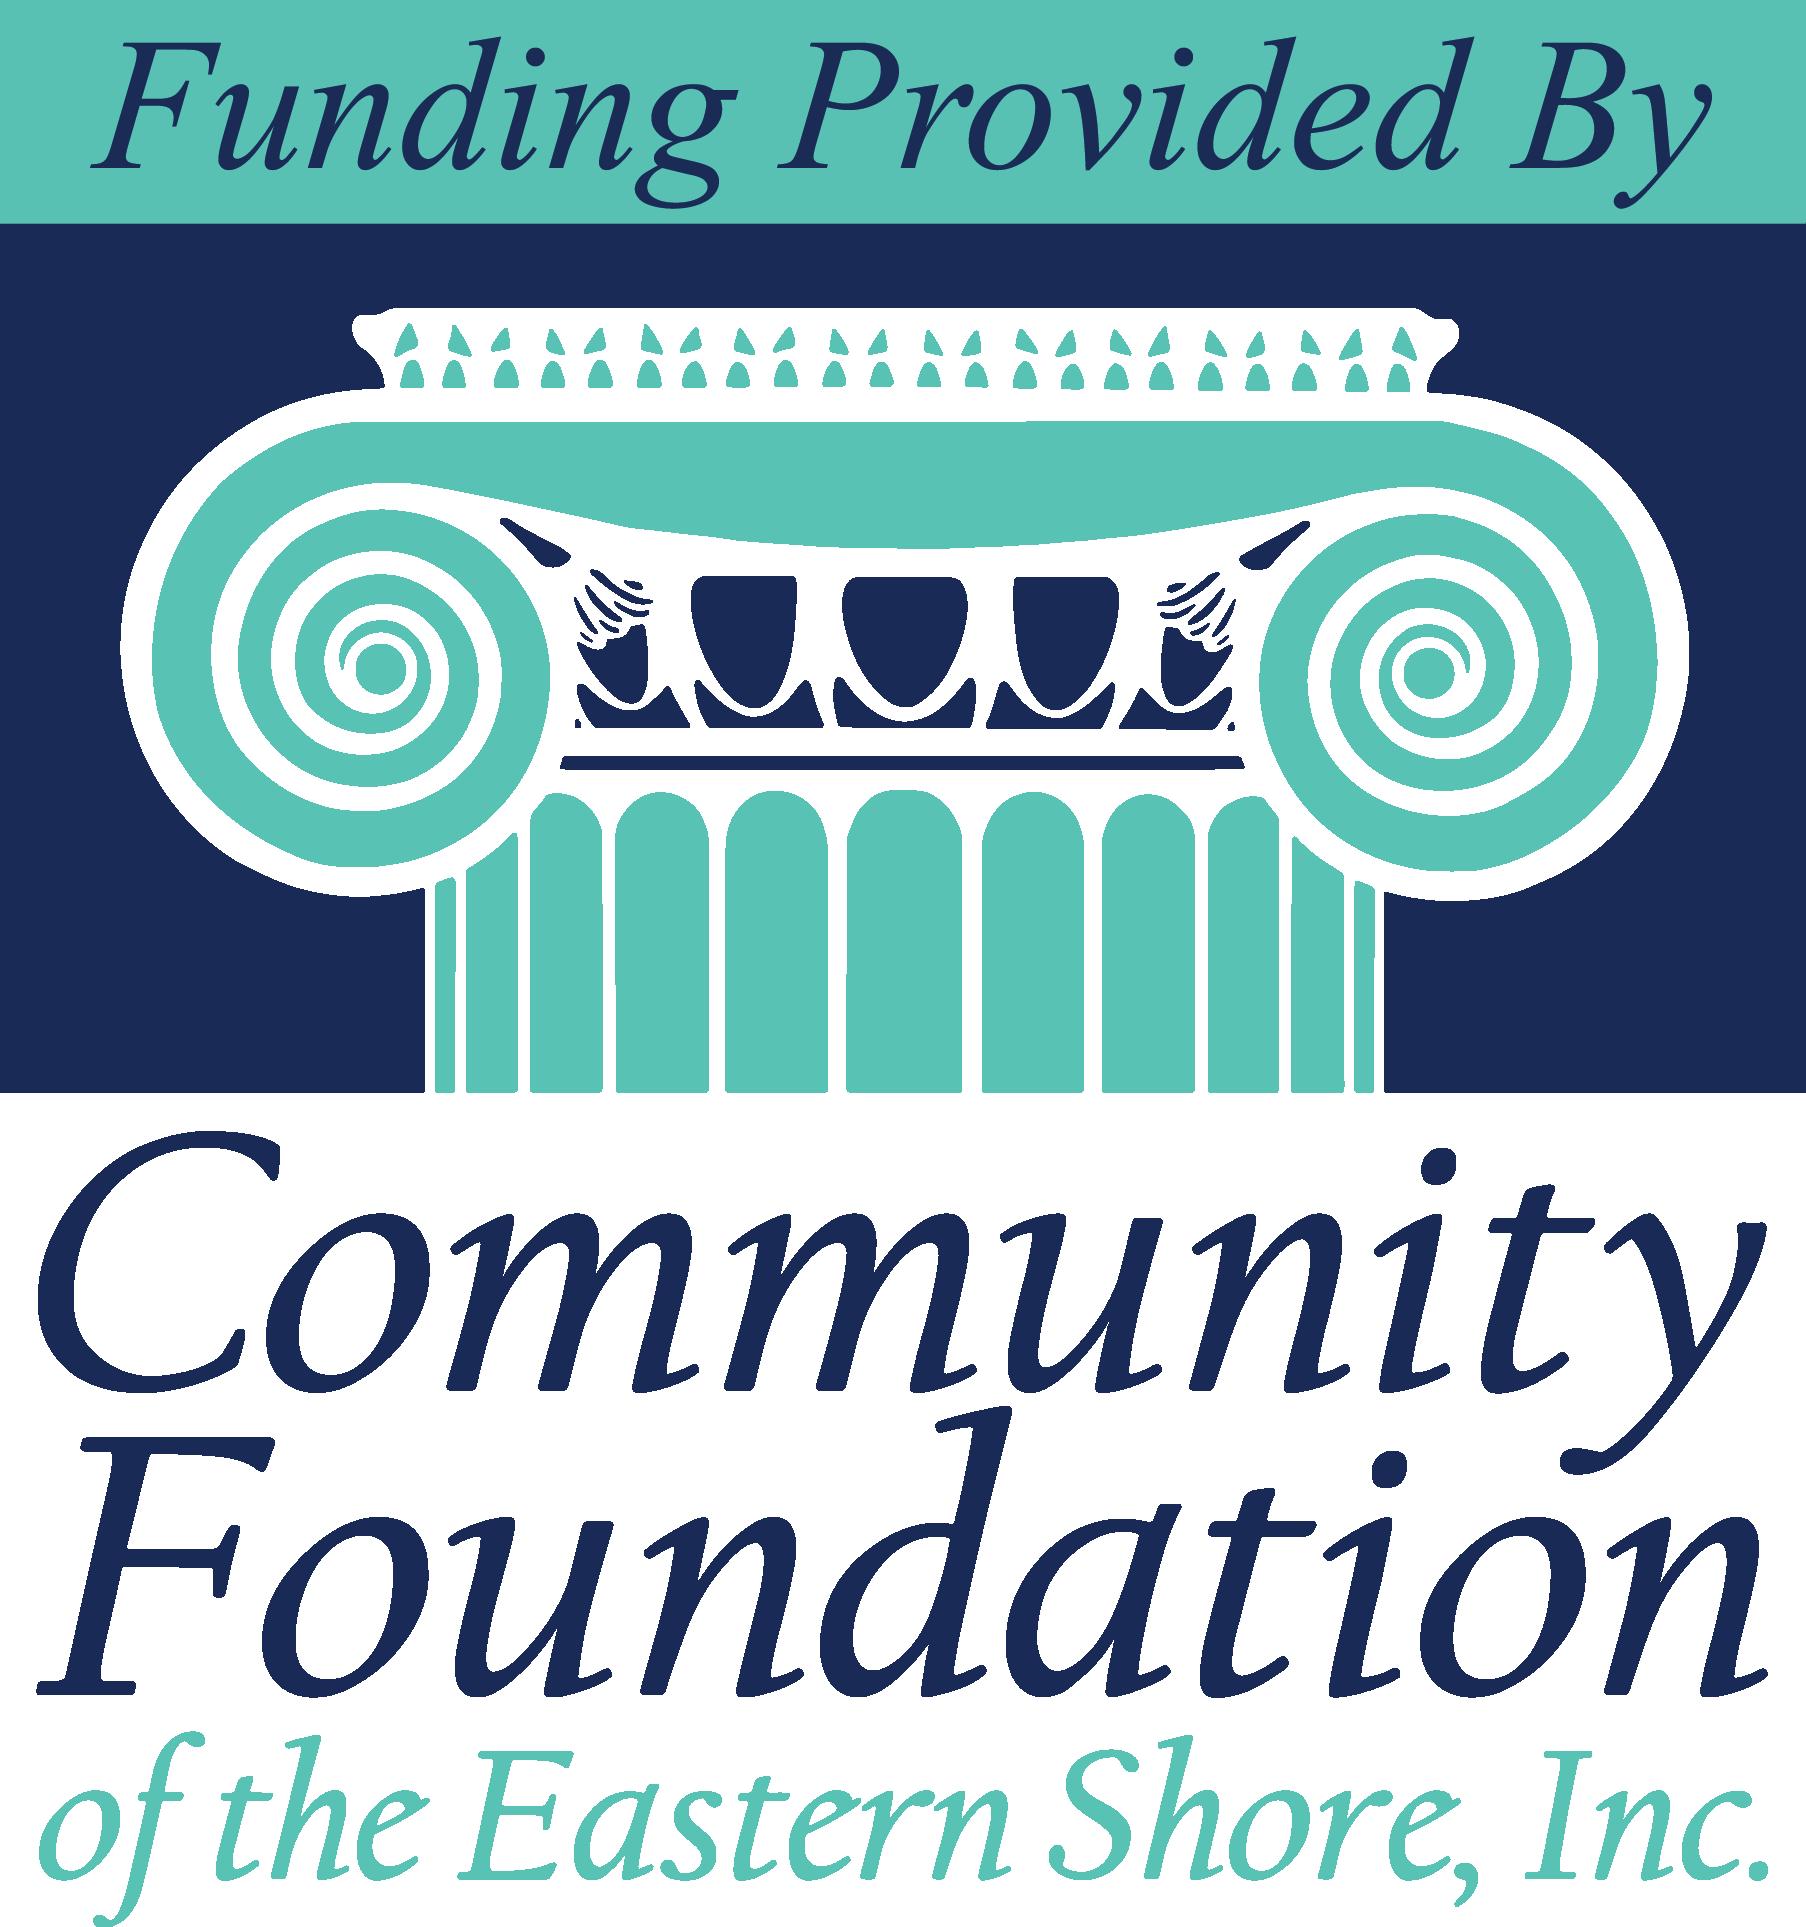 CFES Funding Logo - Clear BG.png